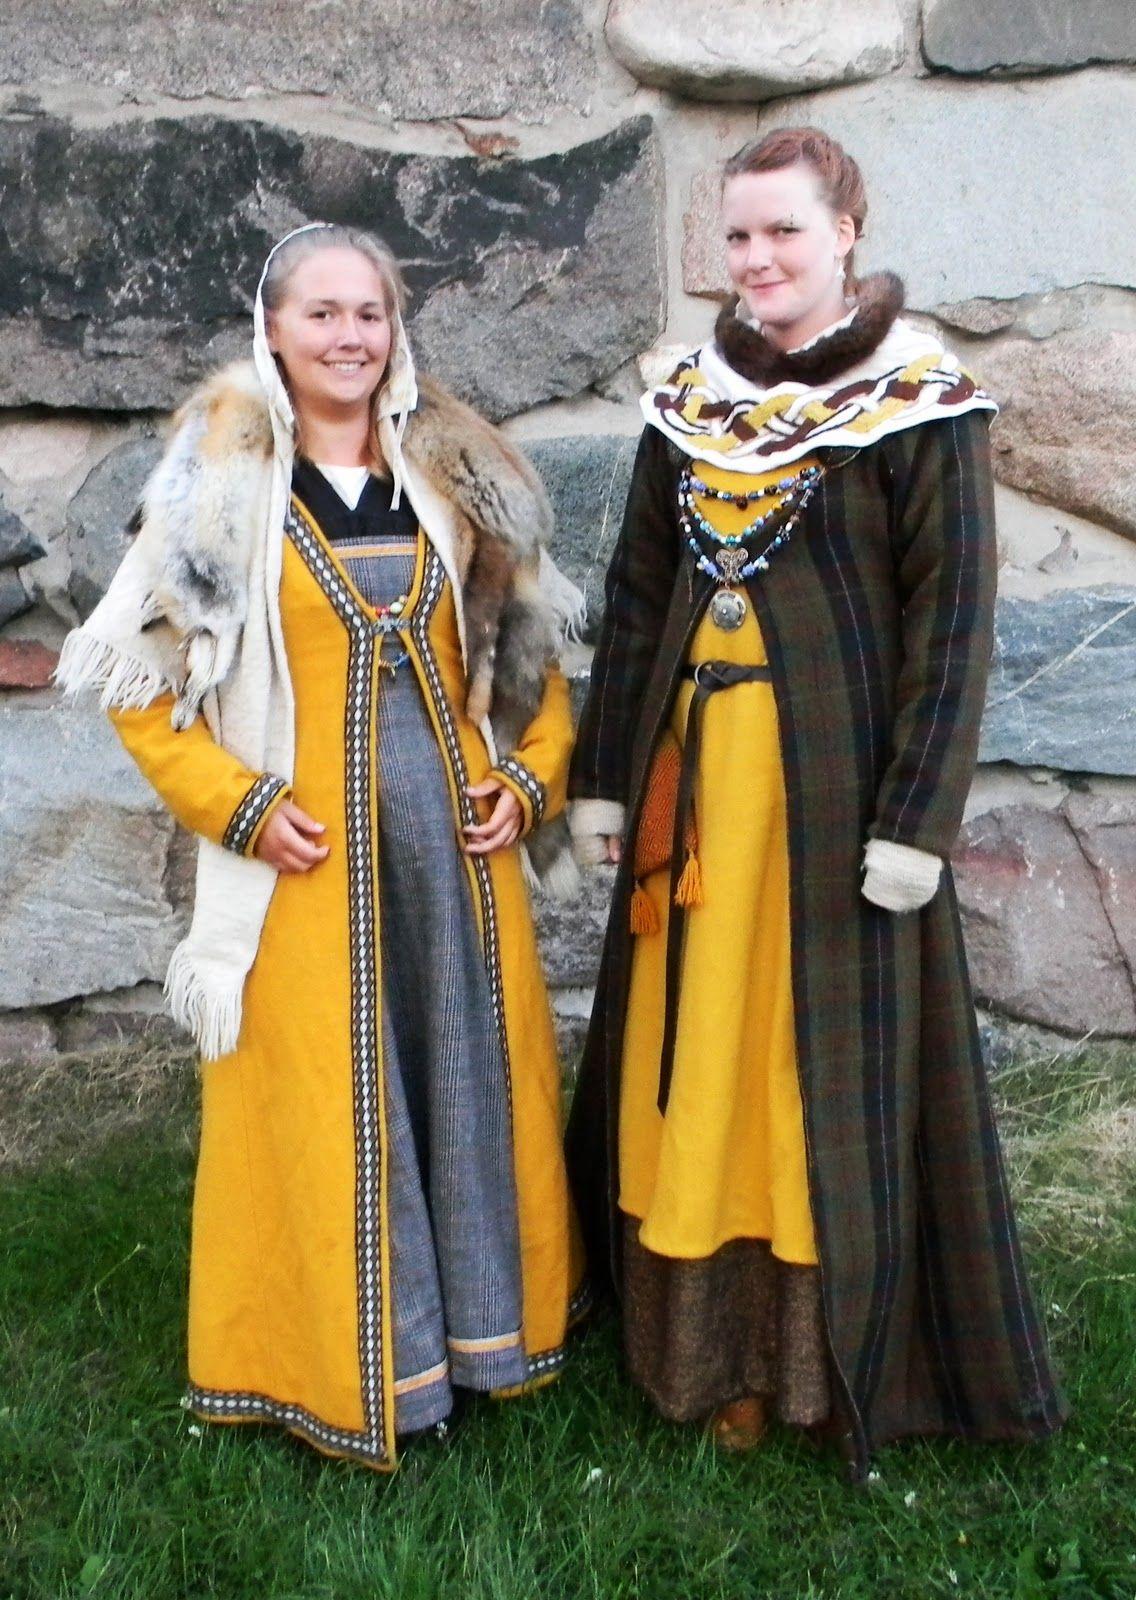 Viking women - coat and embellishment inspiration